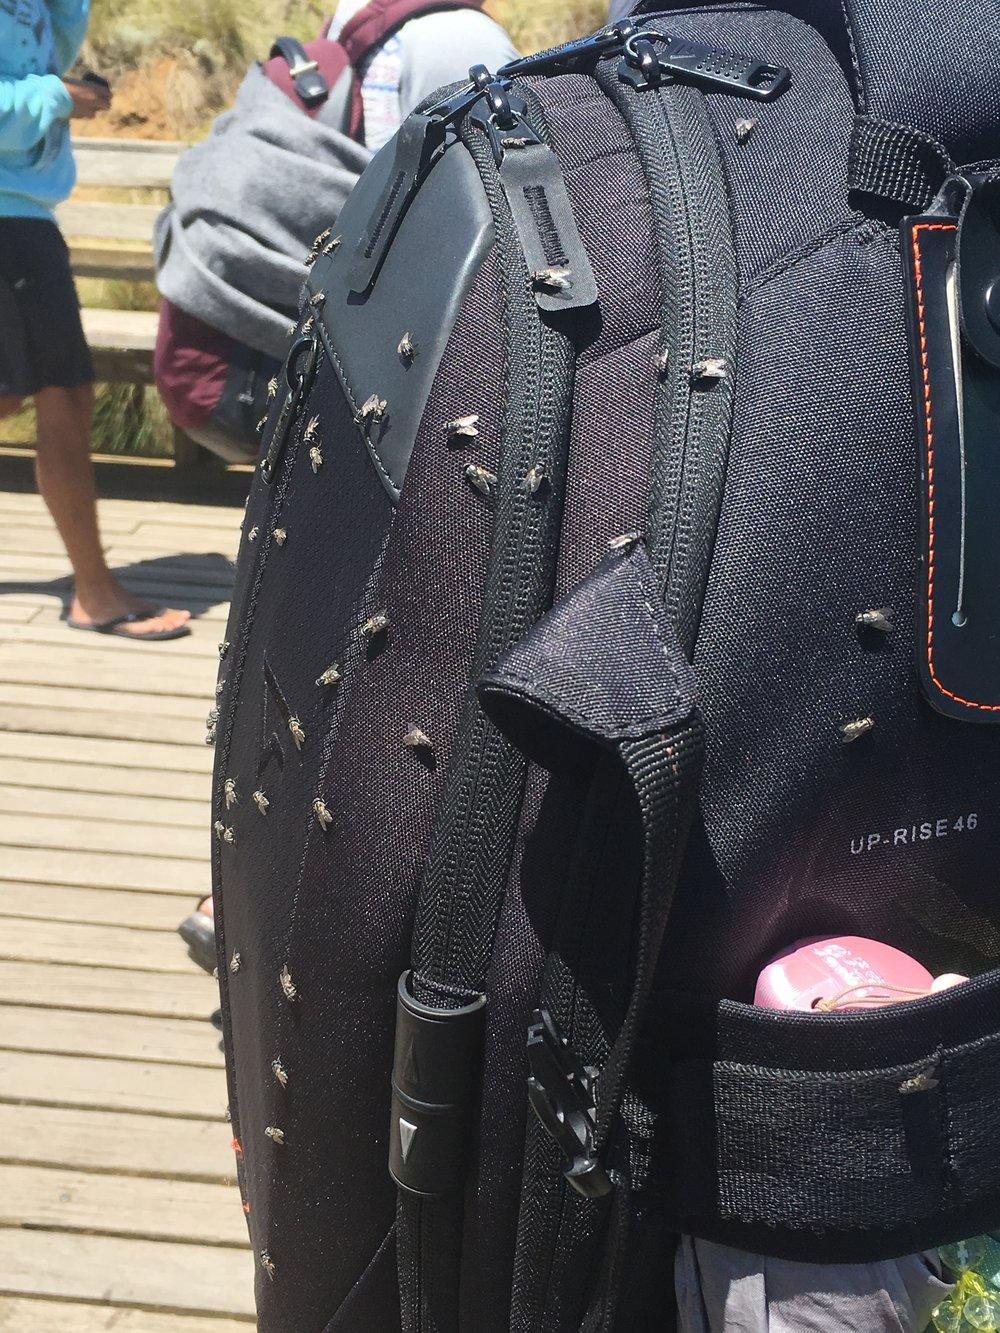 A tourists back pack!